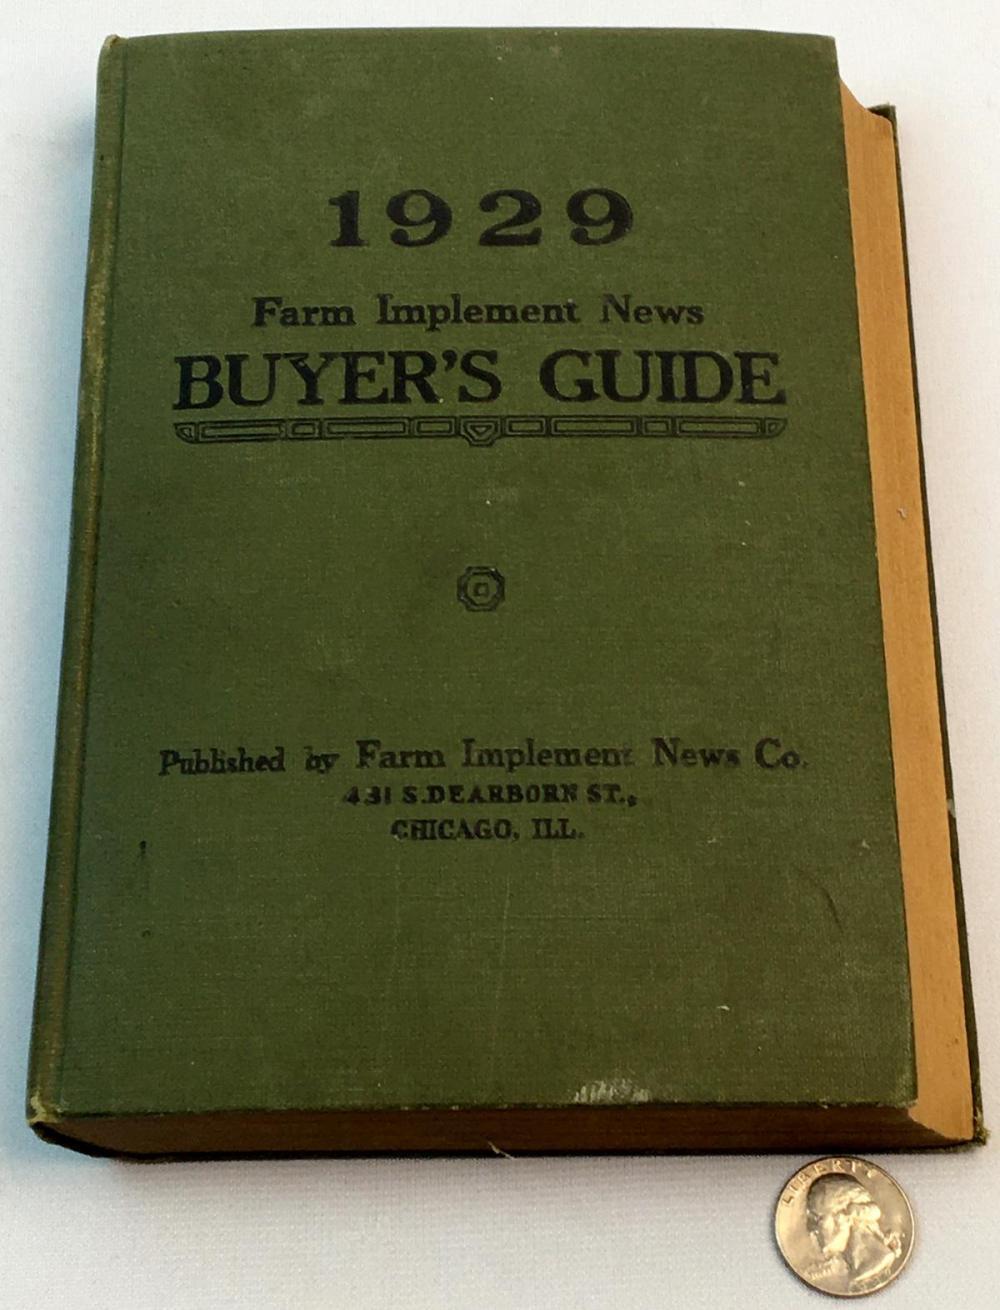 1929 Farm Implement News Buyer's Guide Classified Directory Vol. XXXVIII